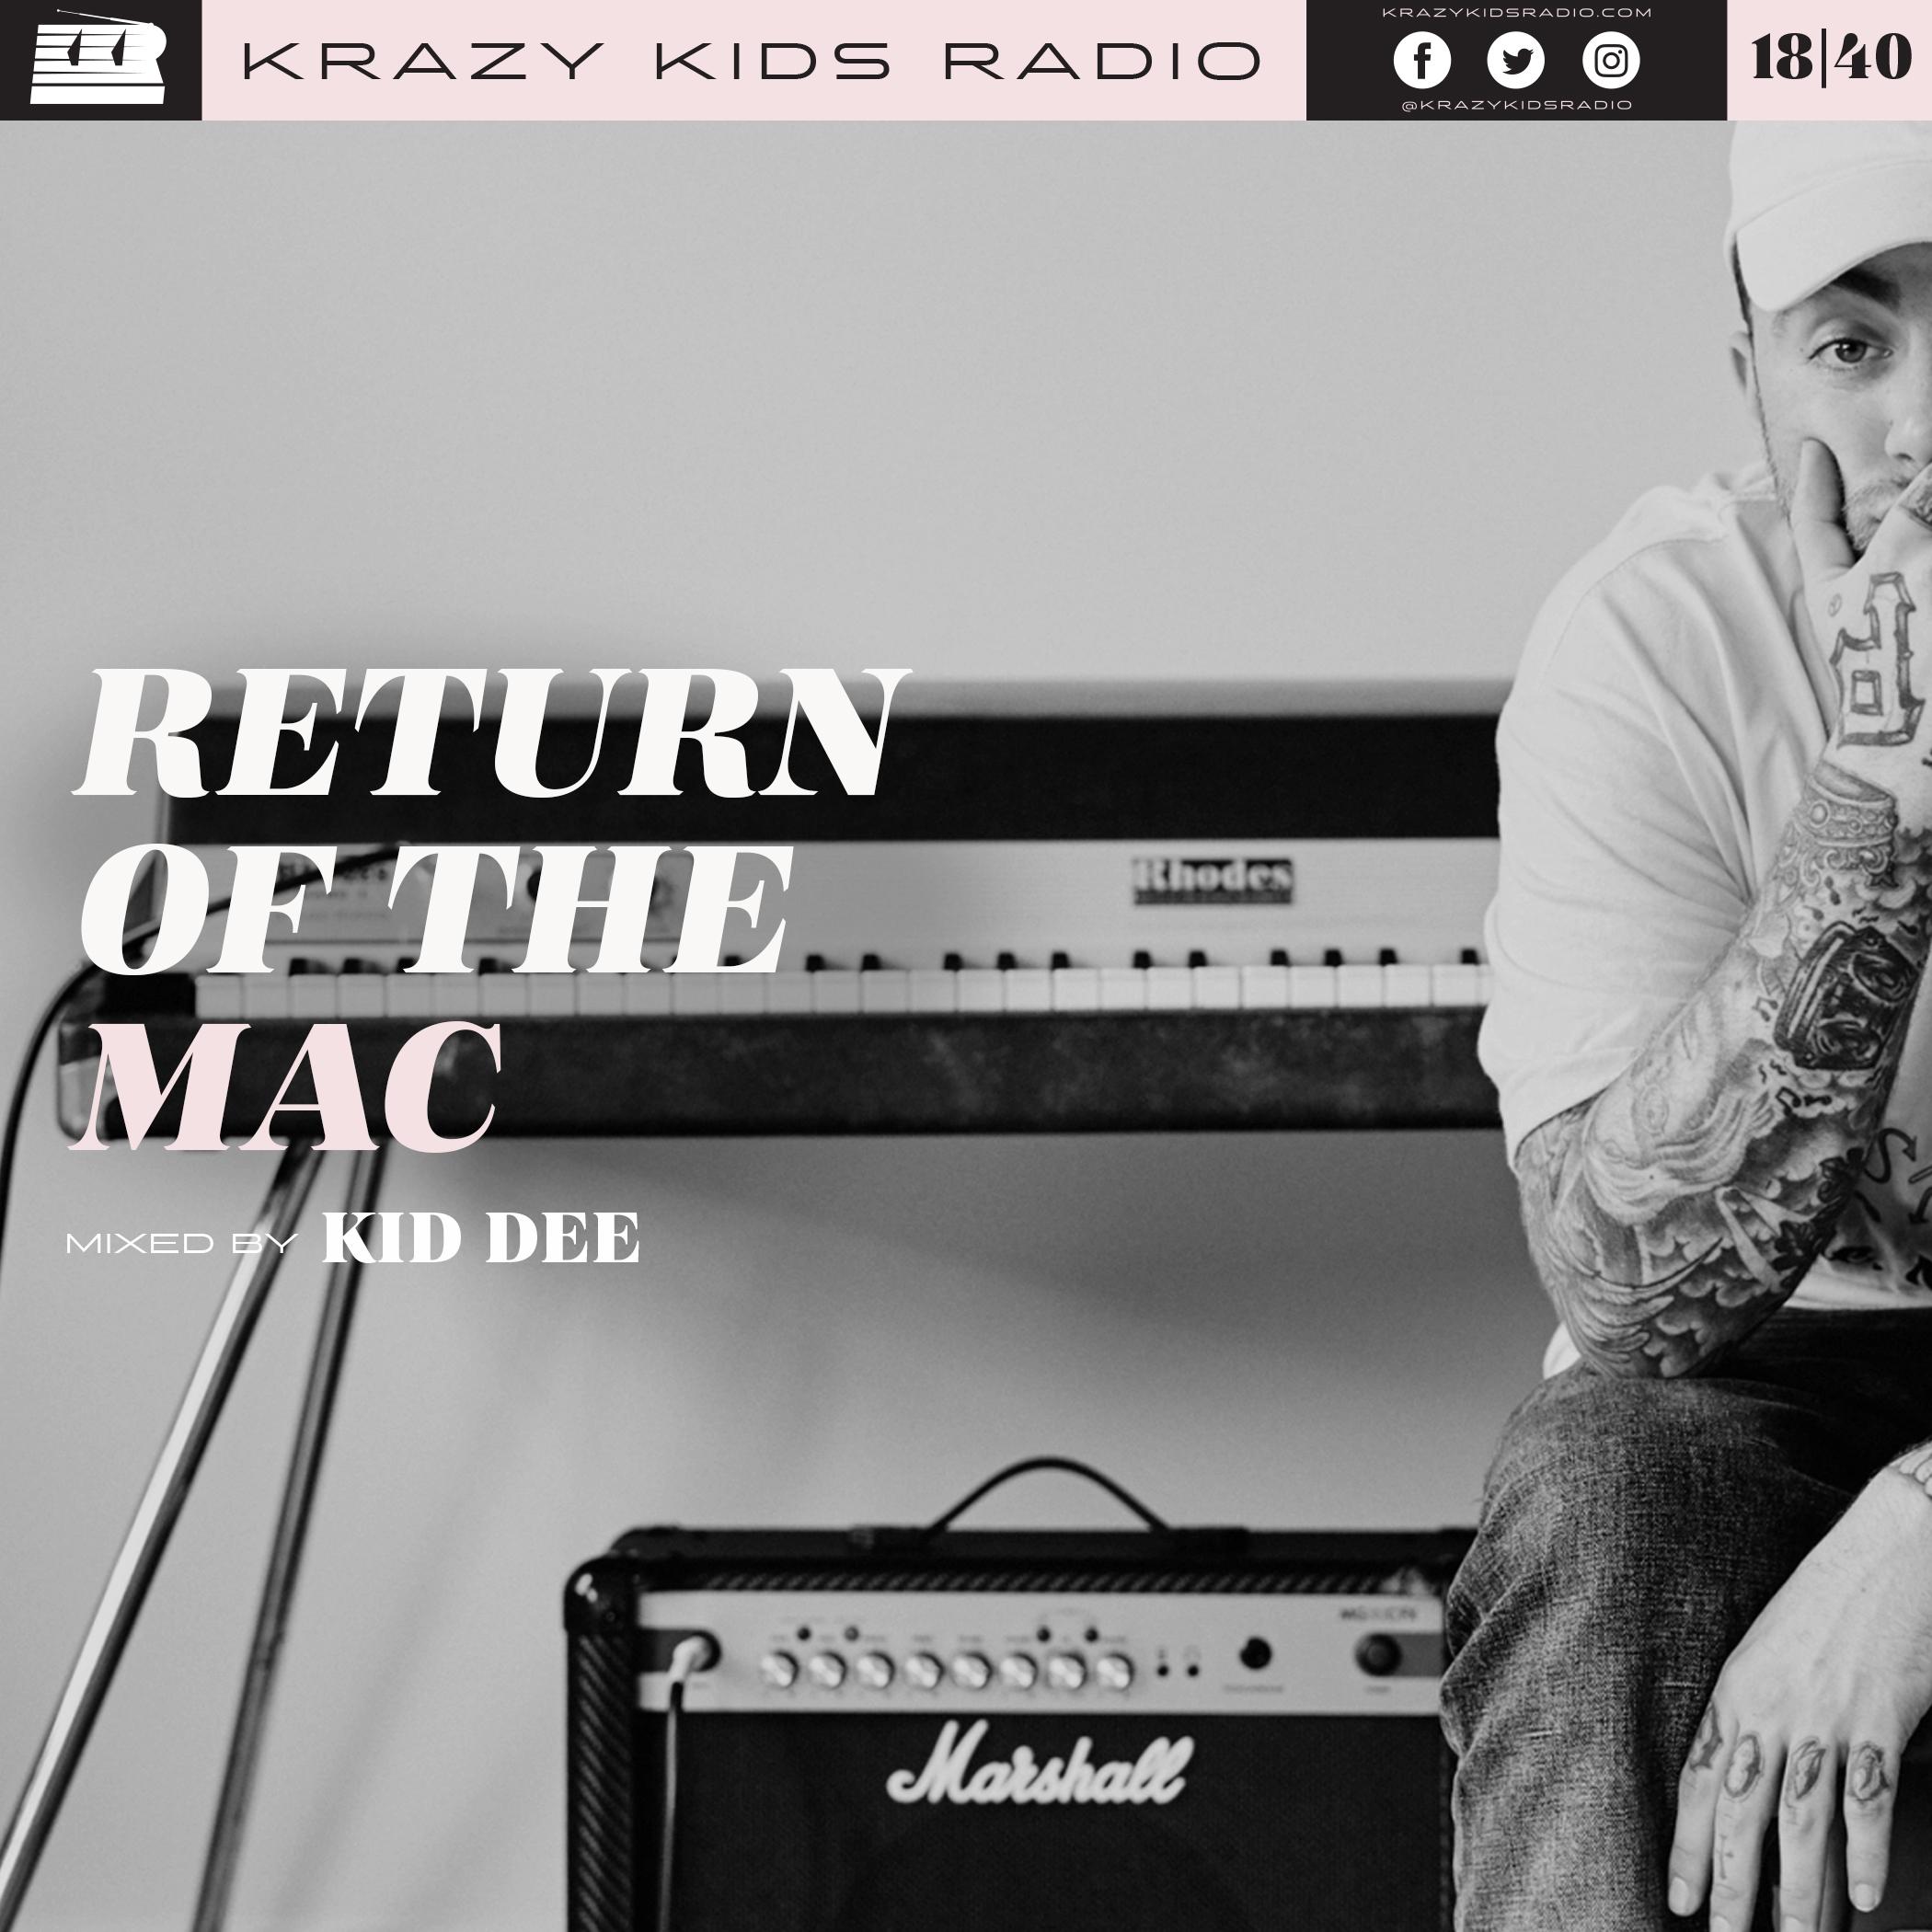 _KKR_RETURN-OF-THE-MAC-.jpg